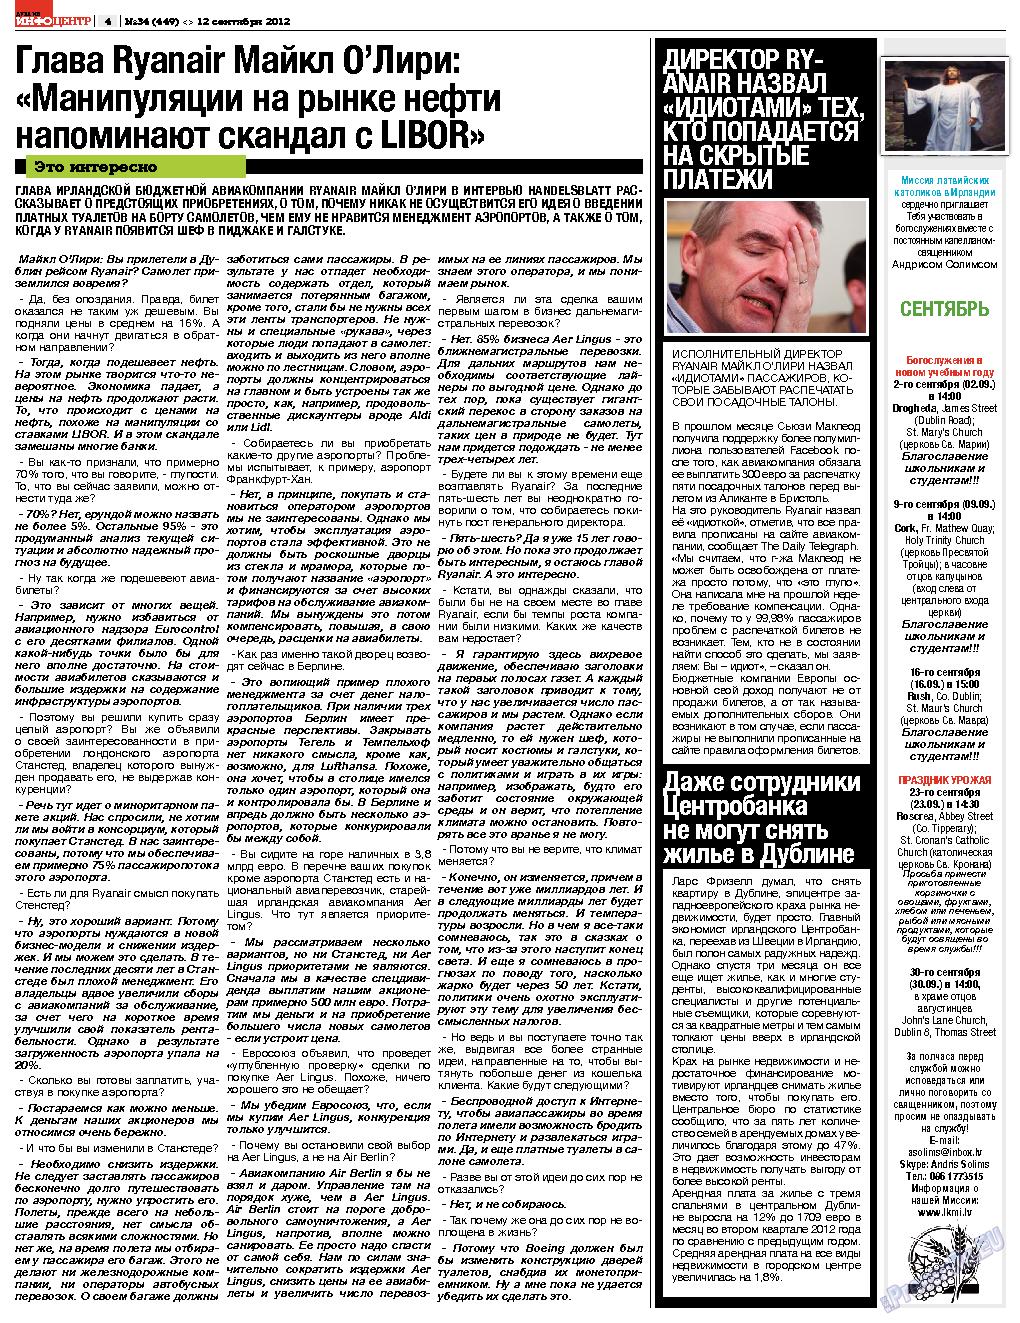 Дублин инфоцентр (газета). 2012 год, номер 34, стр. 4